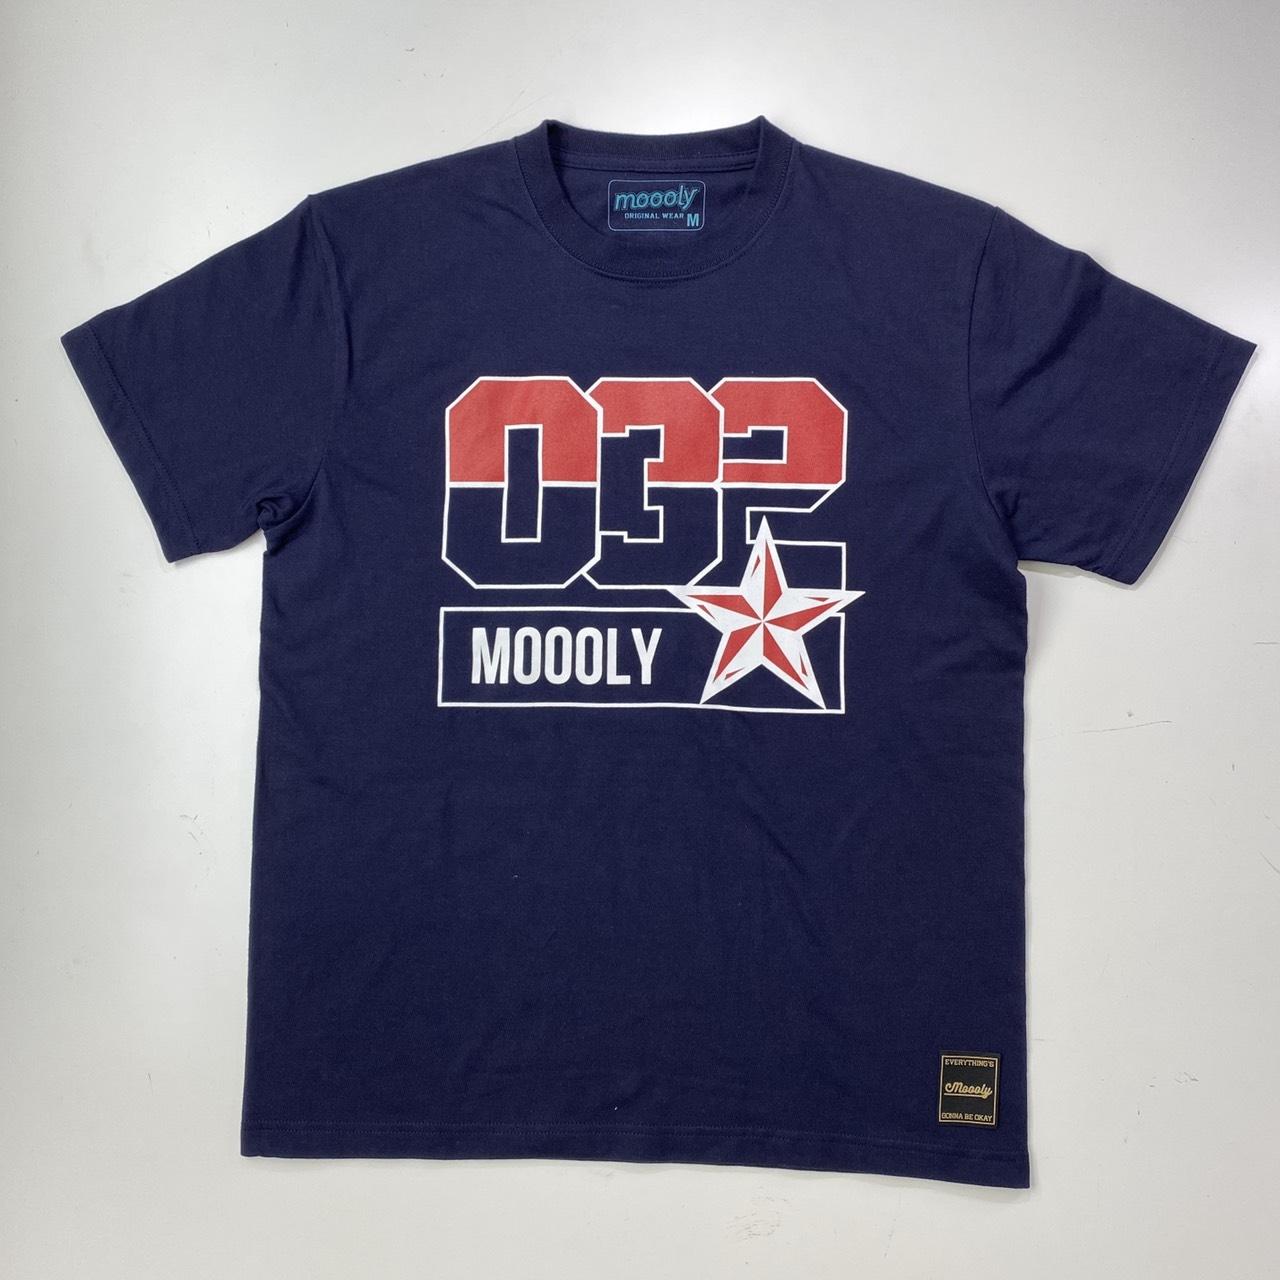 MLYTS-2004-NVY / Moooly / モーリー / 山内 盛久 / Tシャツ